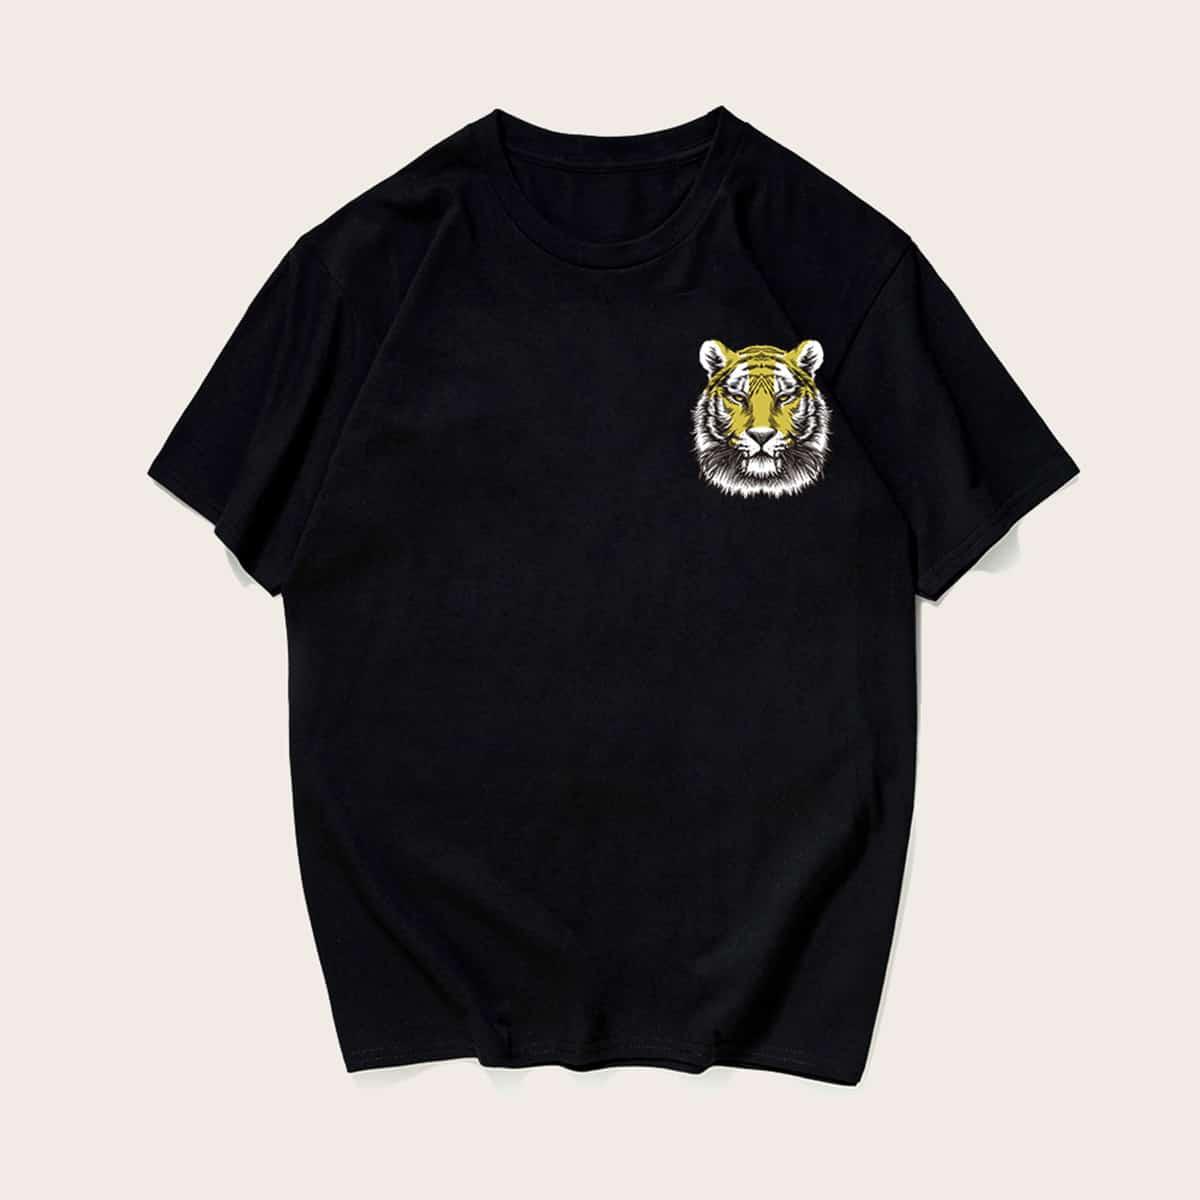 Zwart Casual Dieren Shirts mannen